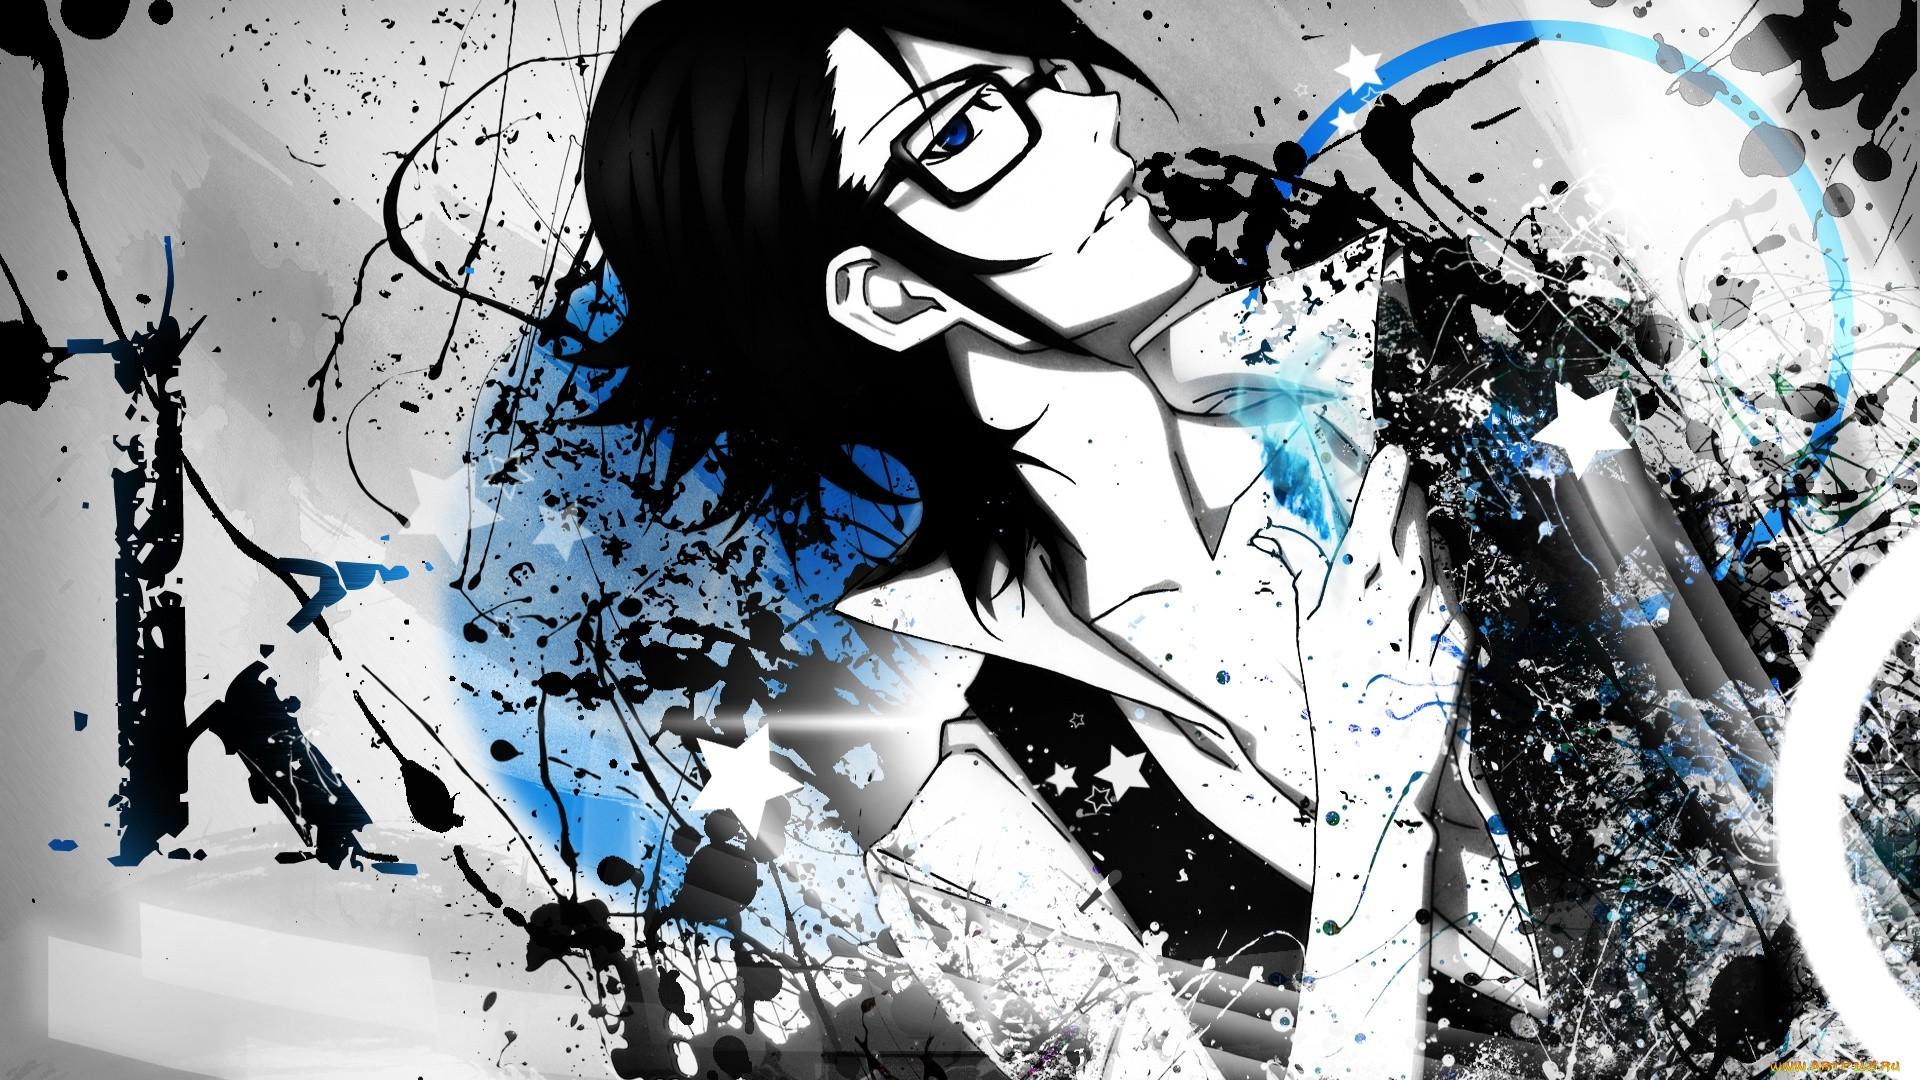 Anime Guy With Glasses Full HD Wallpaper